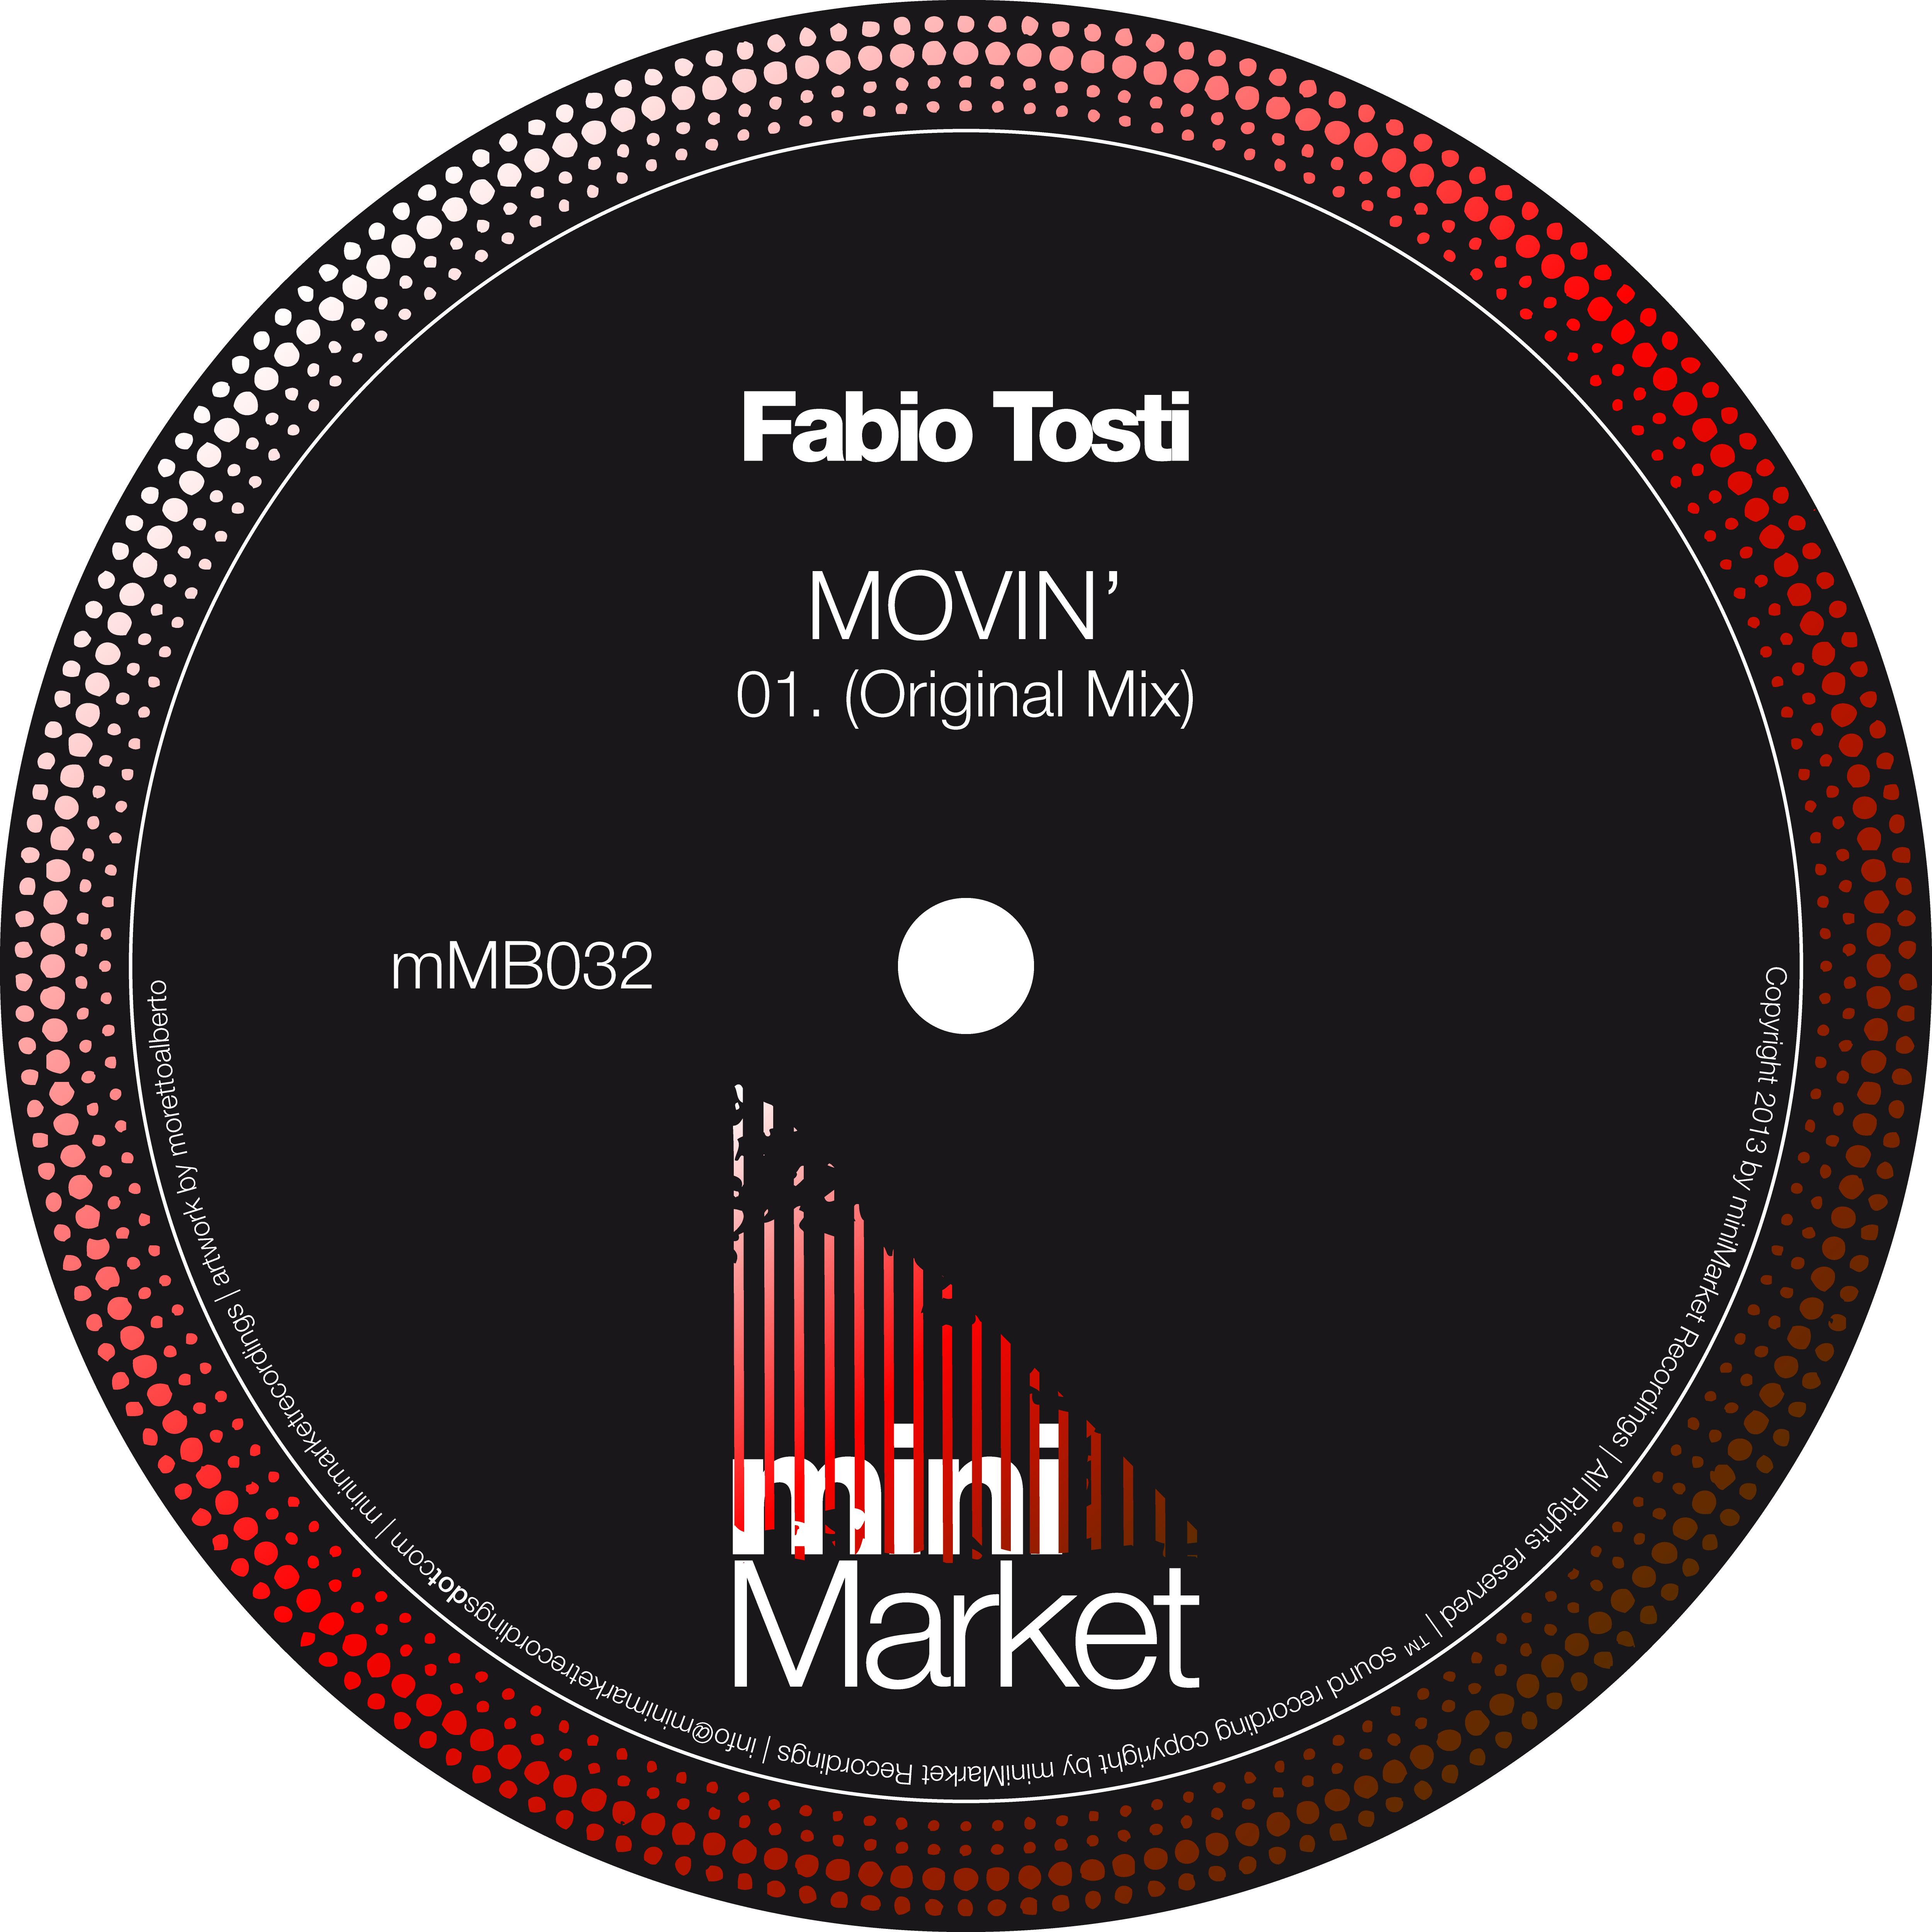 Fabio Tosti (Movin)